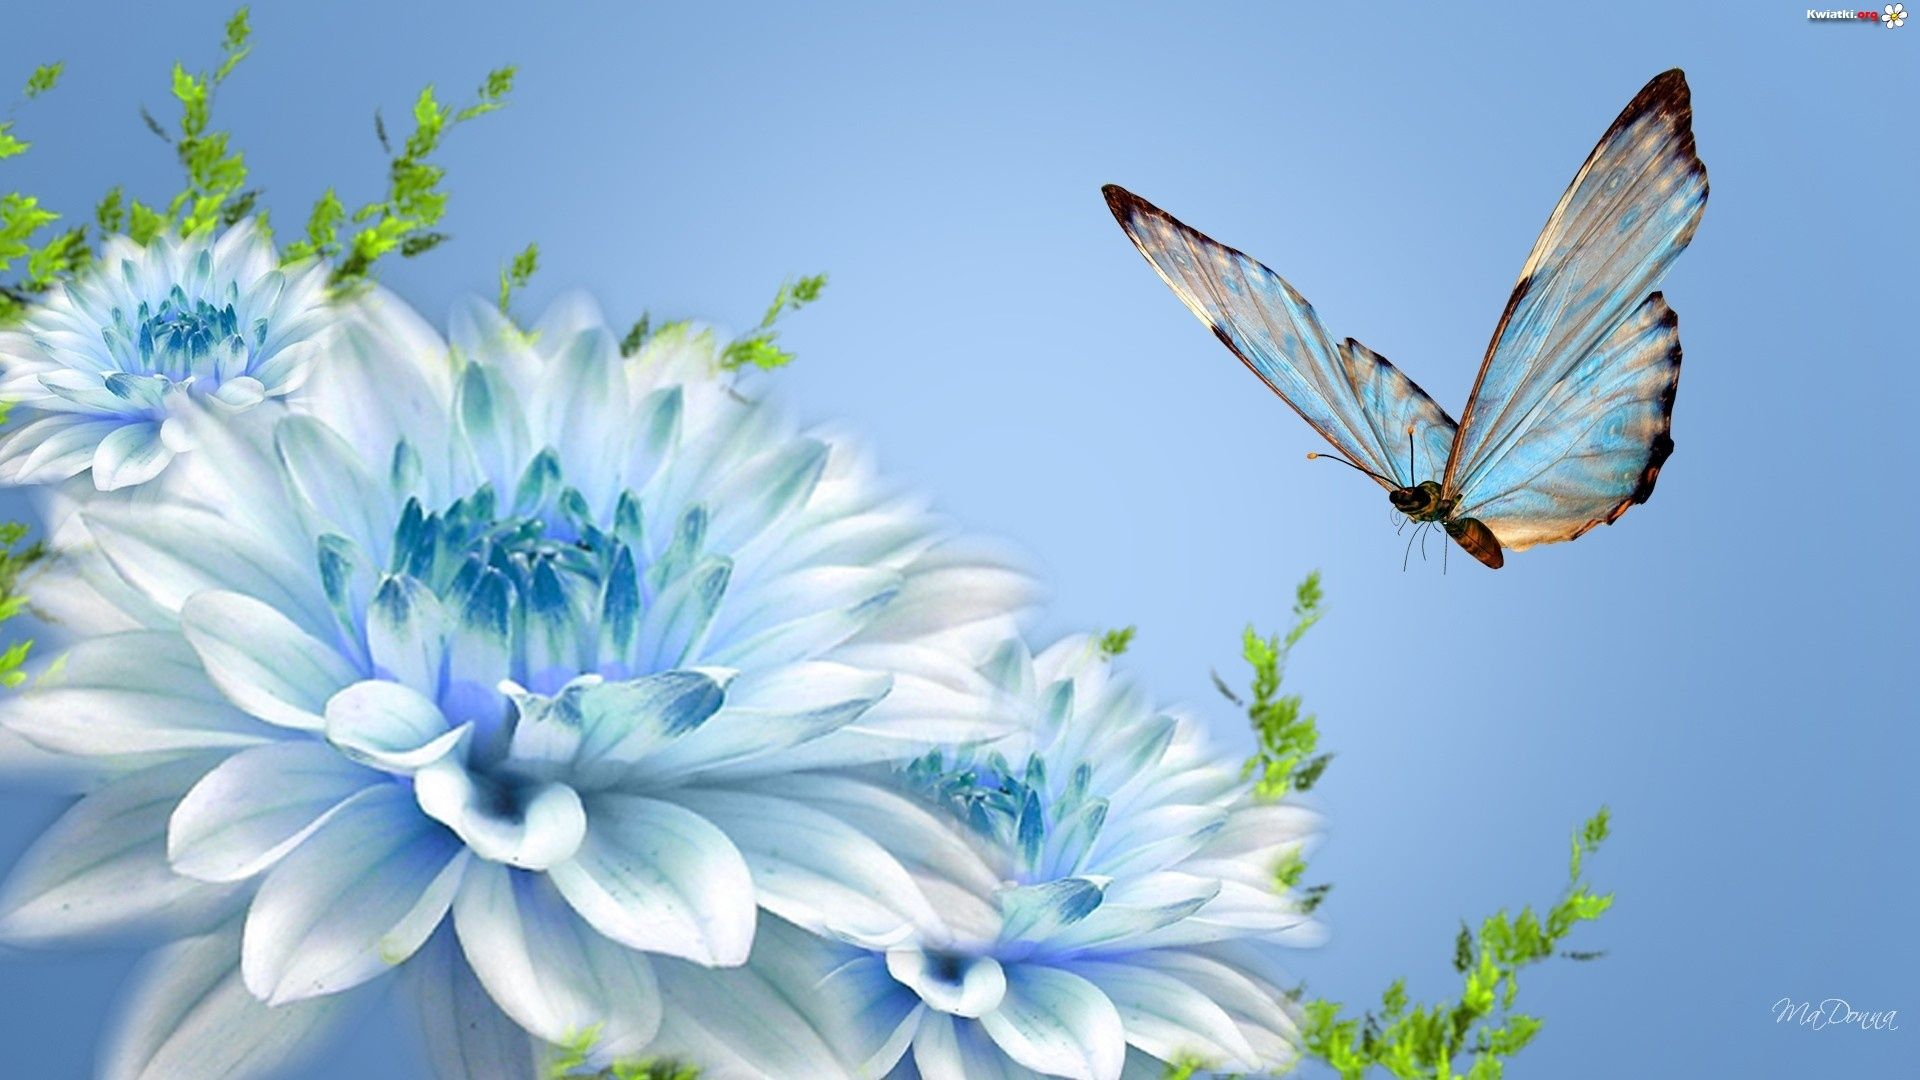 Wallpaper Blue Butterfly And Beautiful Blue Flowers 1920x1080 Blue Flower Wallpaper